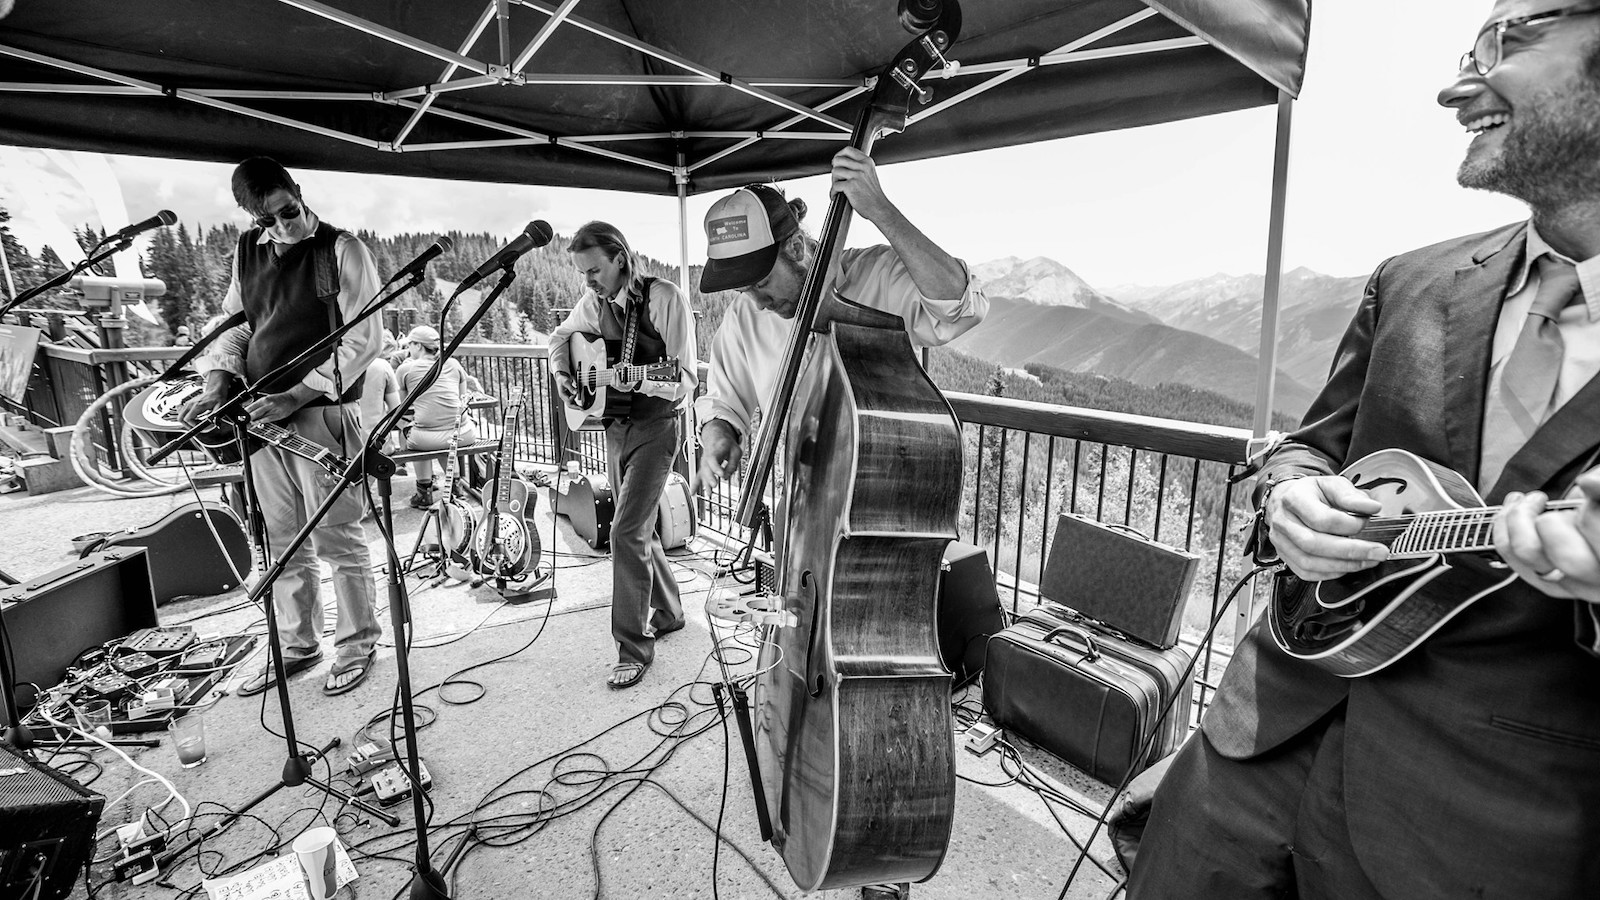 Gambar band bermain bluegrass di Aspen Snowmass, Colorado